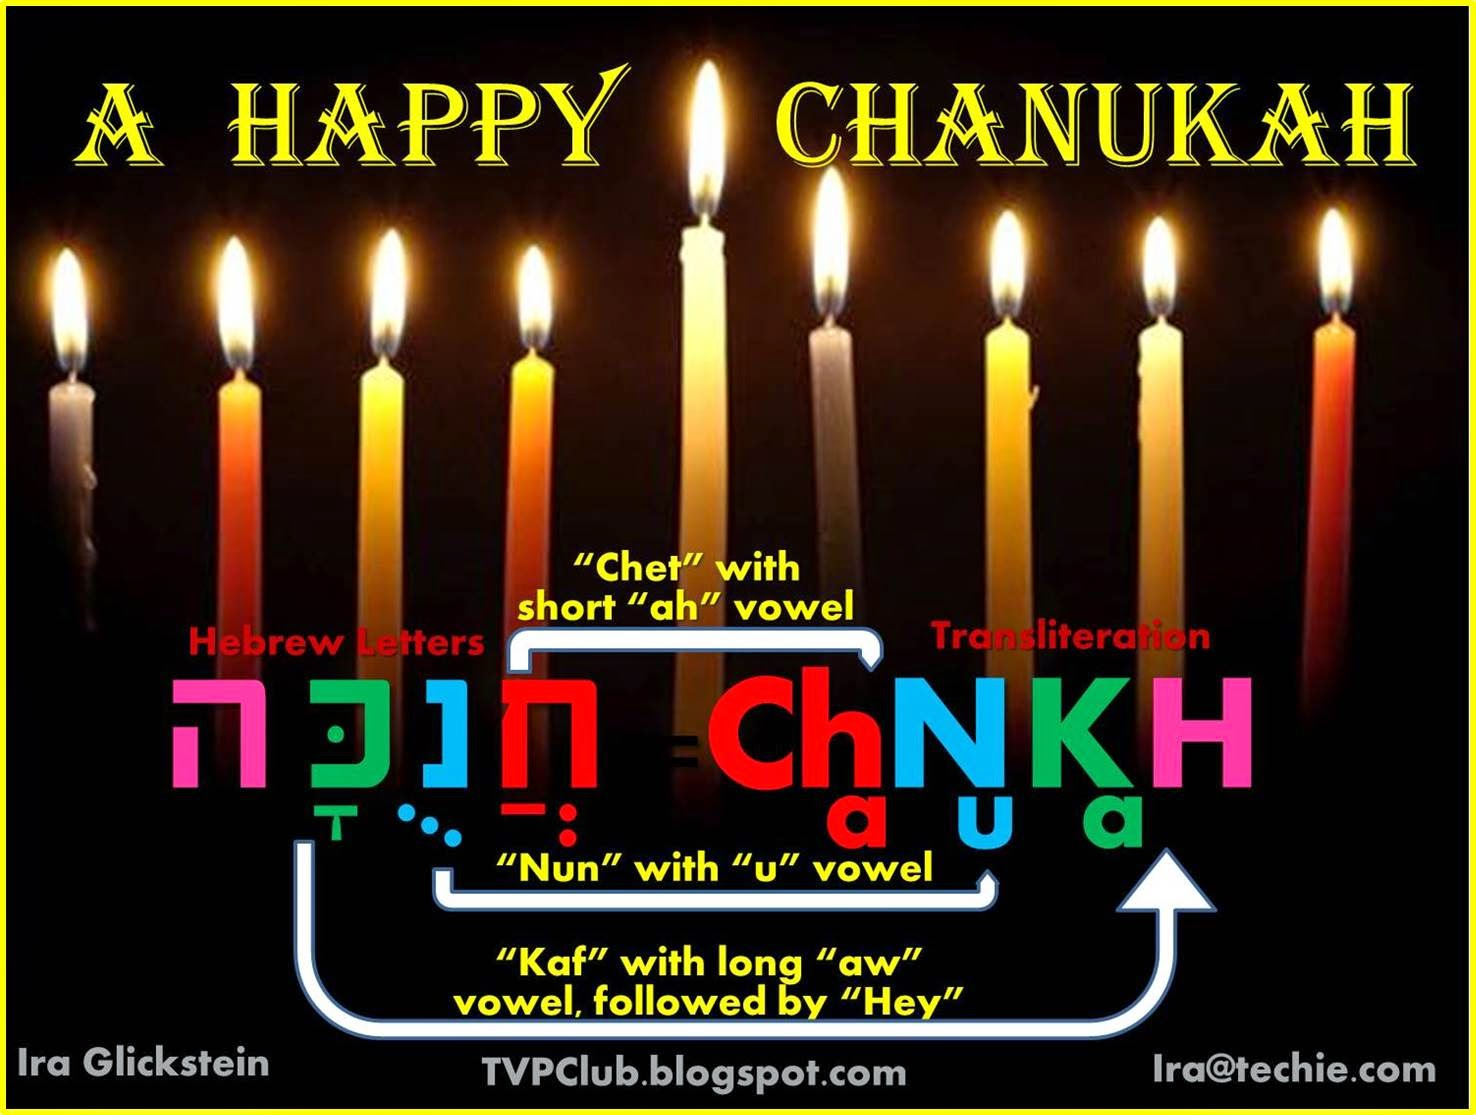 chanukah around the world